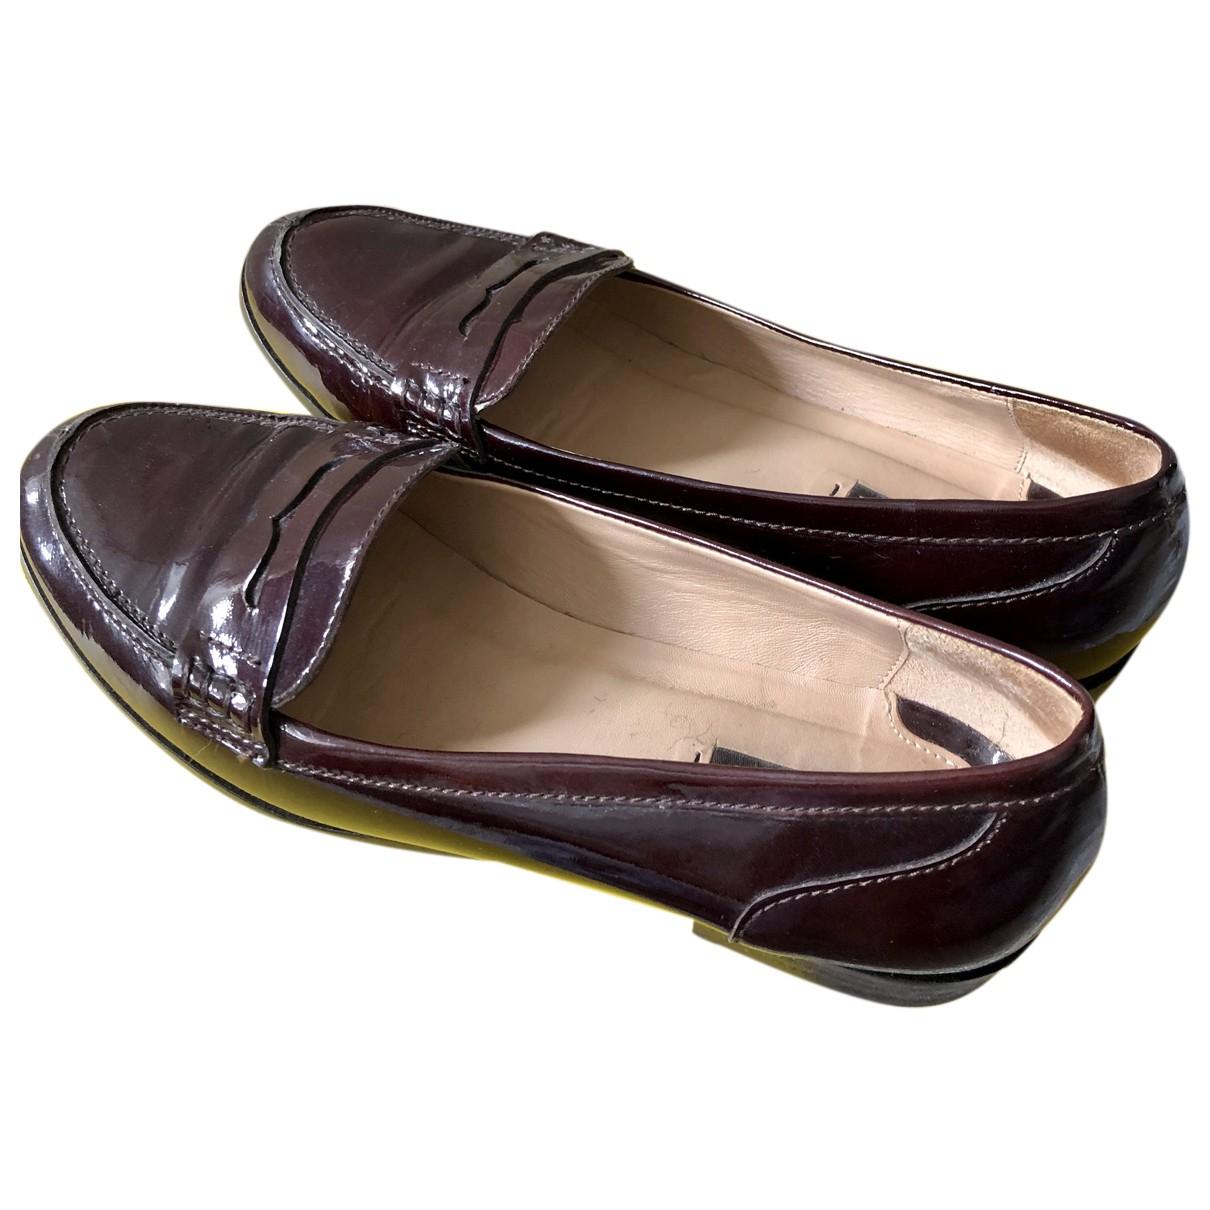 Massimo Dutti N Burgundy Patent leather Flats for Women 39 EU